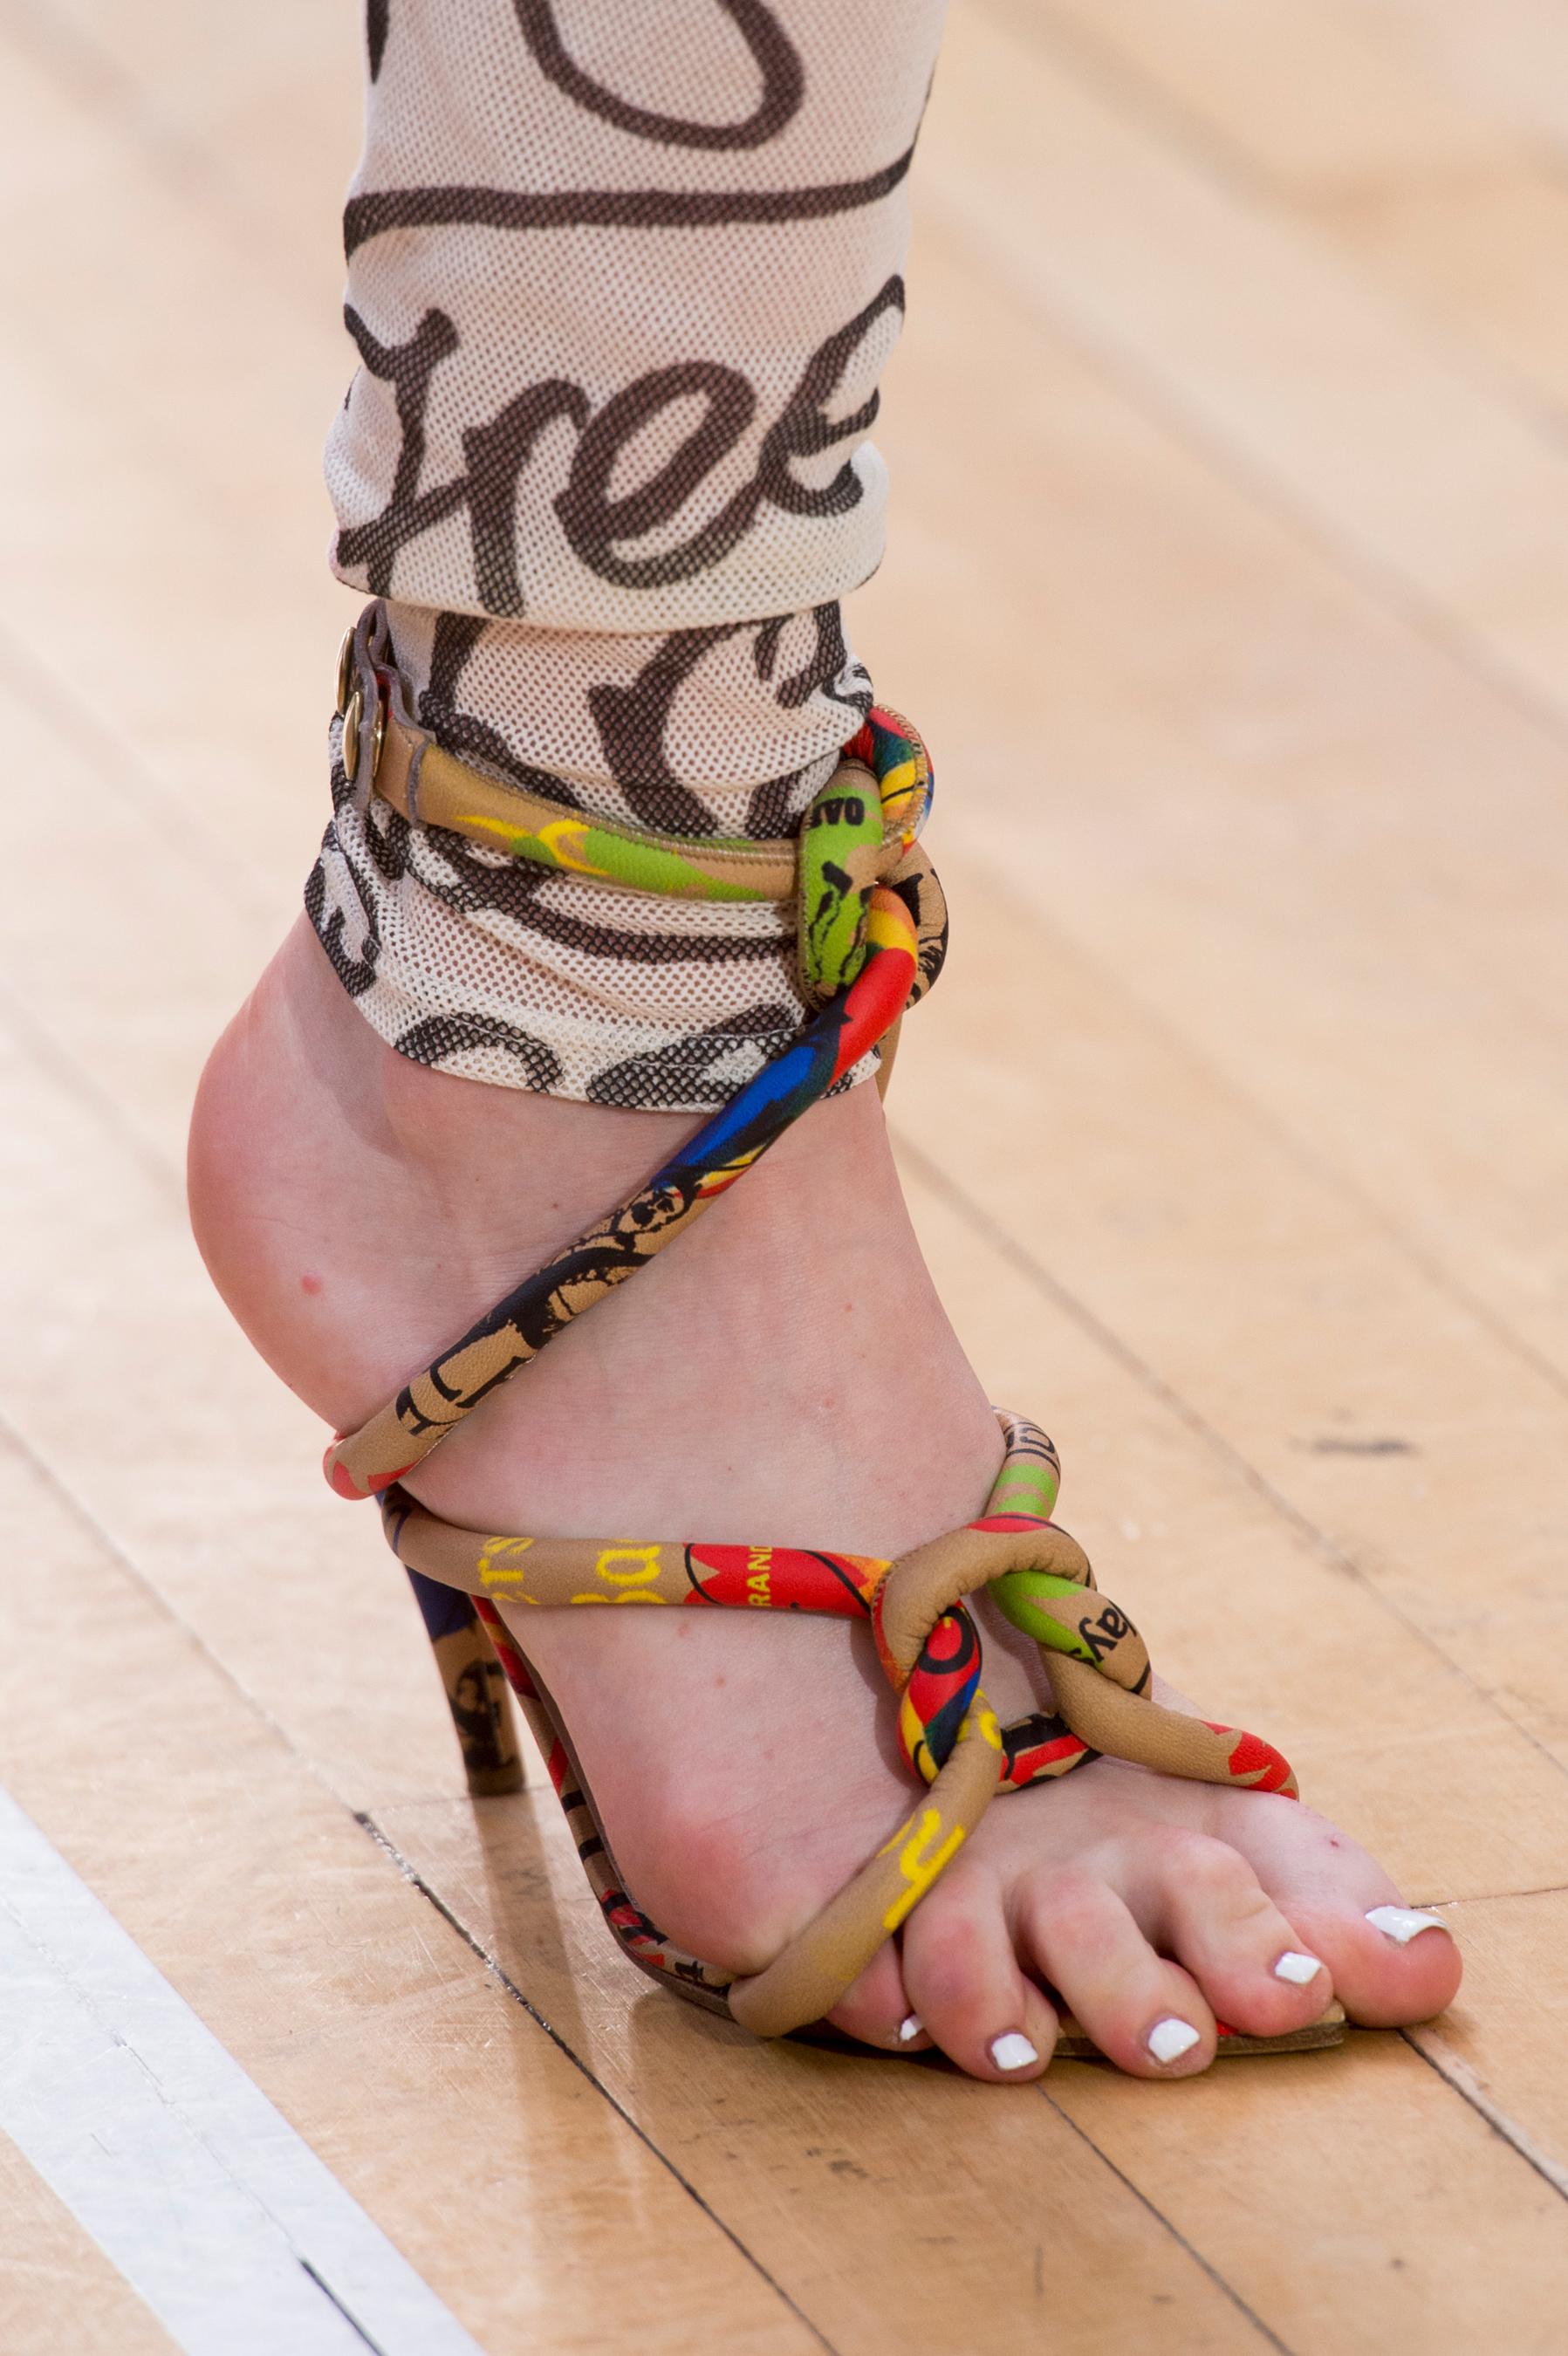 Vivienne Westwood весна лето 2018 туфли на каблуке